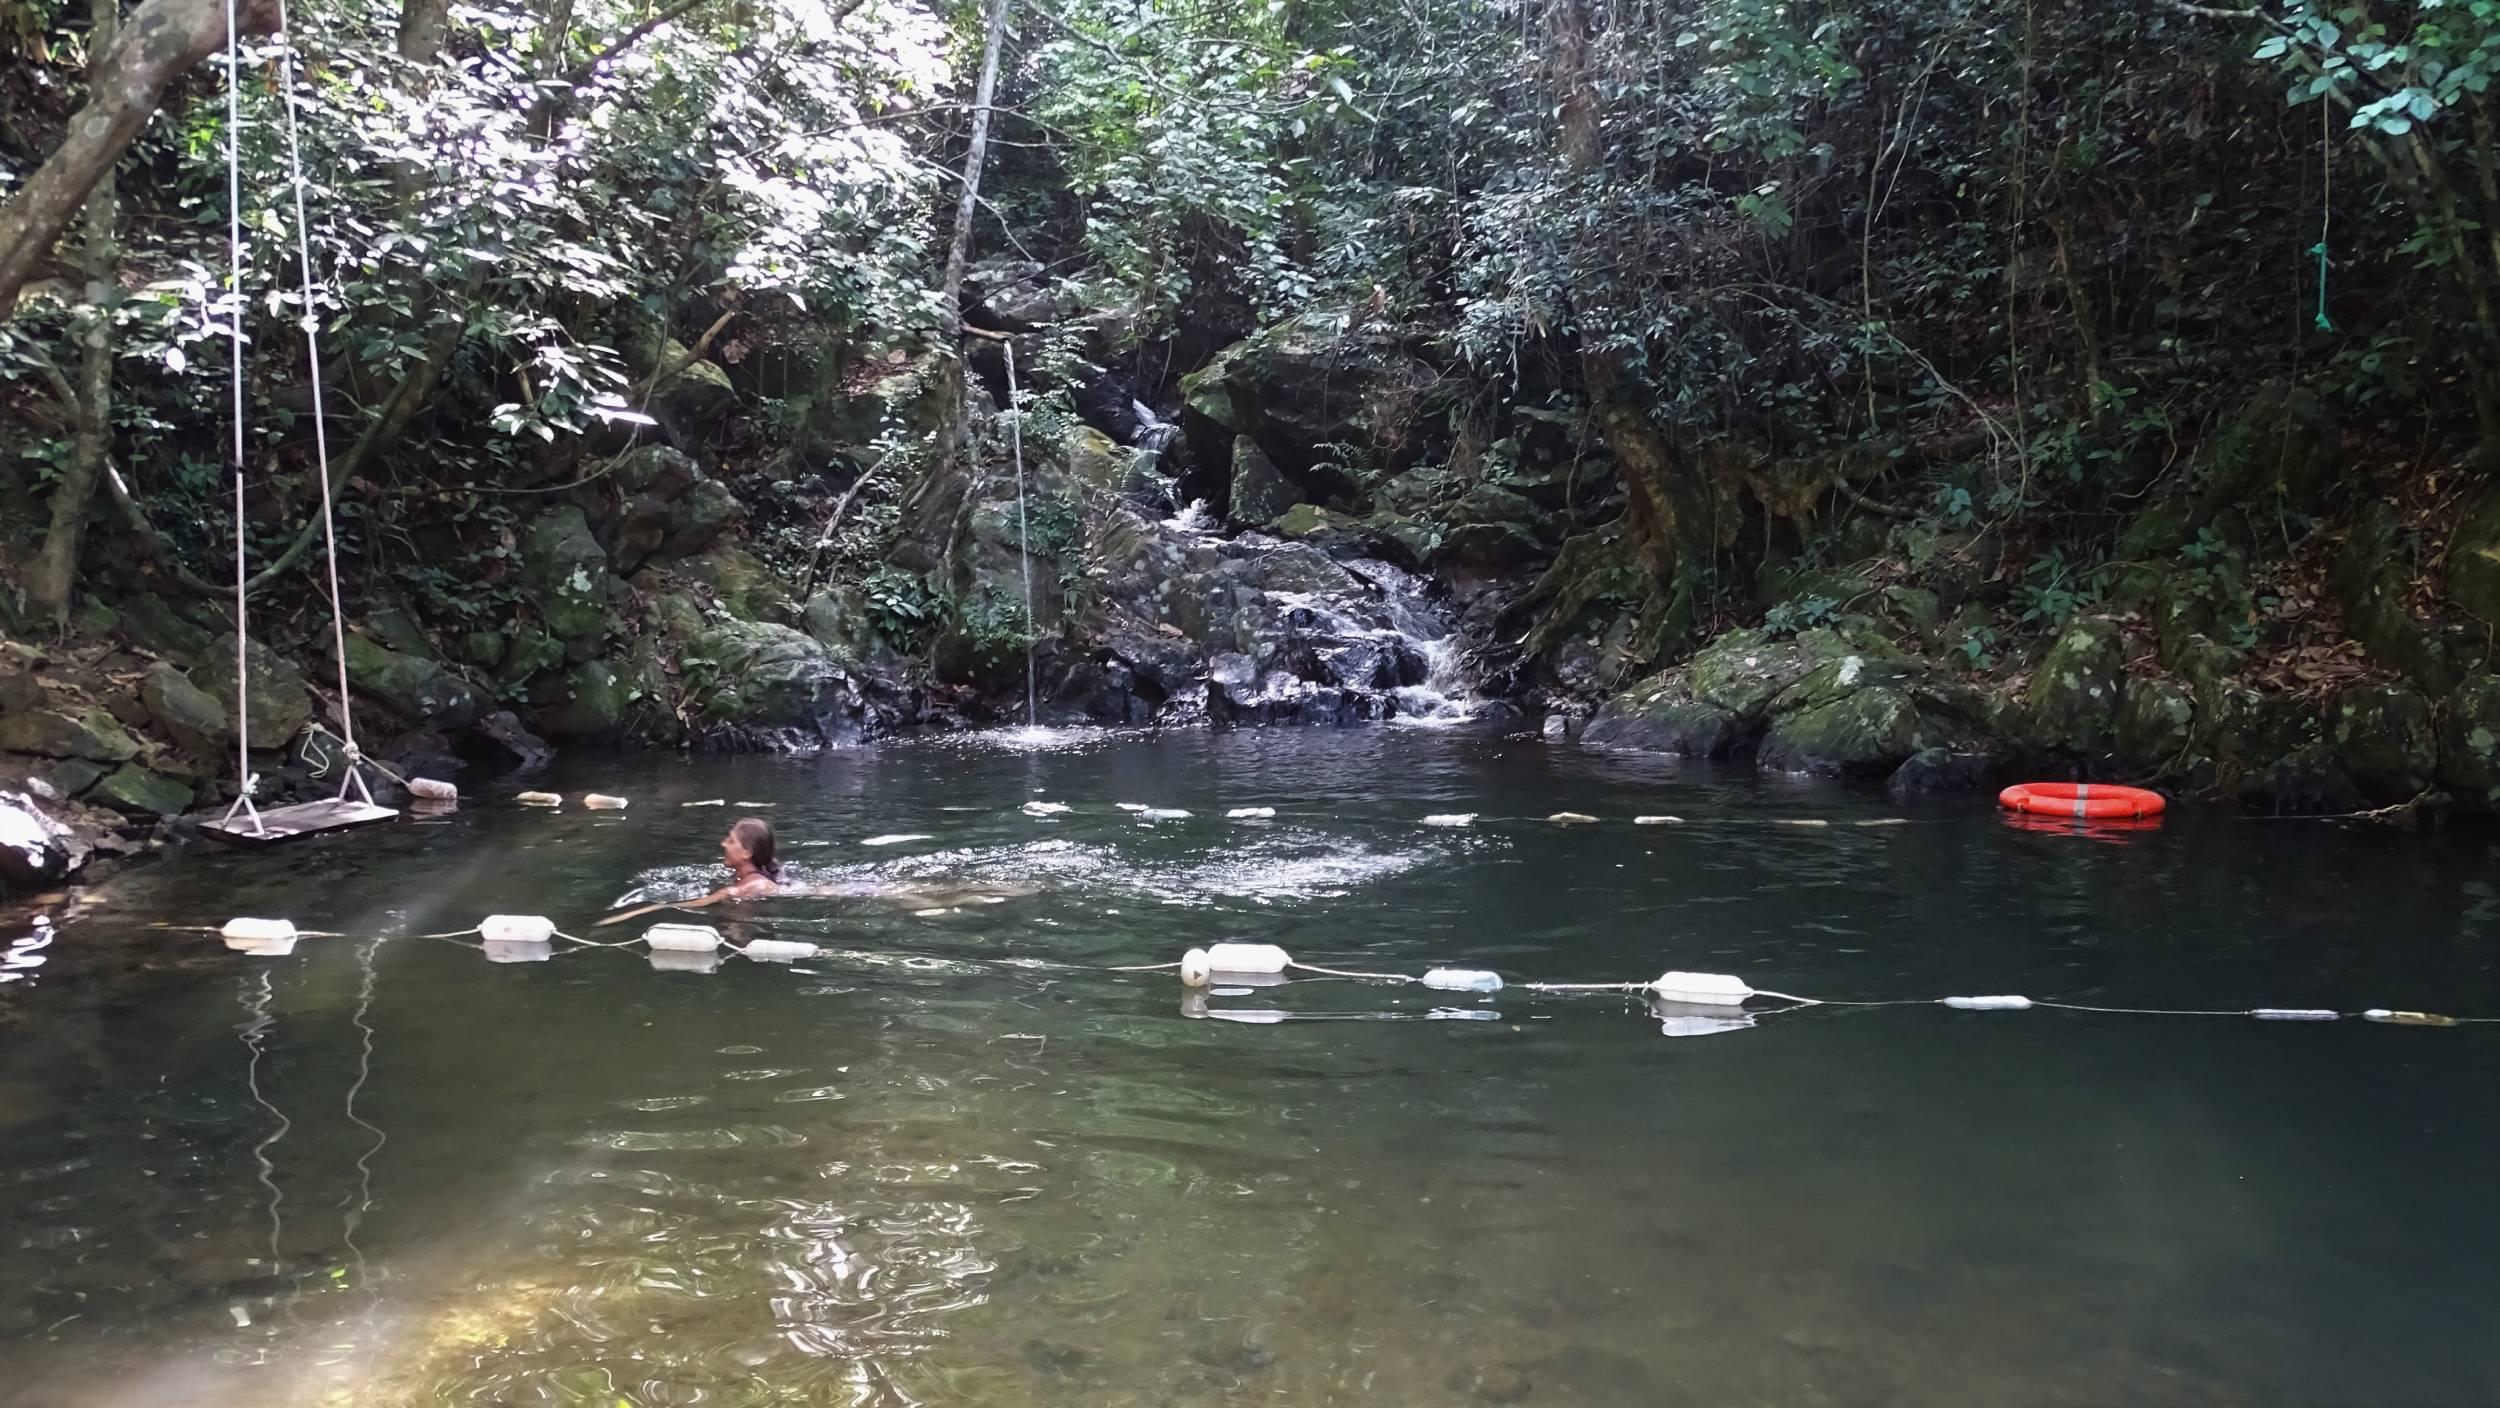 Swimming in a small waterhole on a stream inside Phong Nha Ke Bang National Park